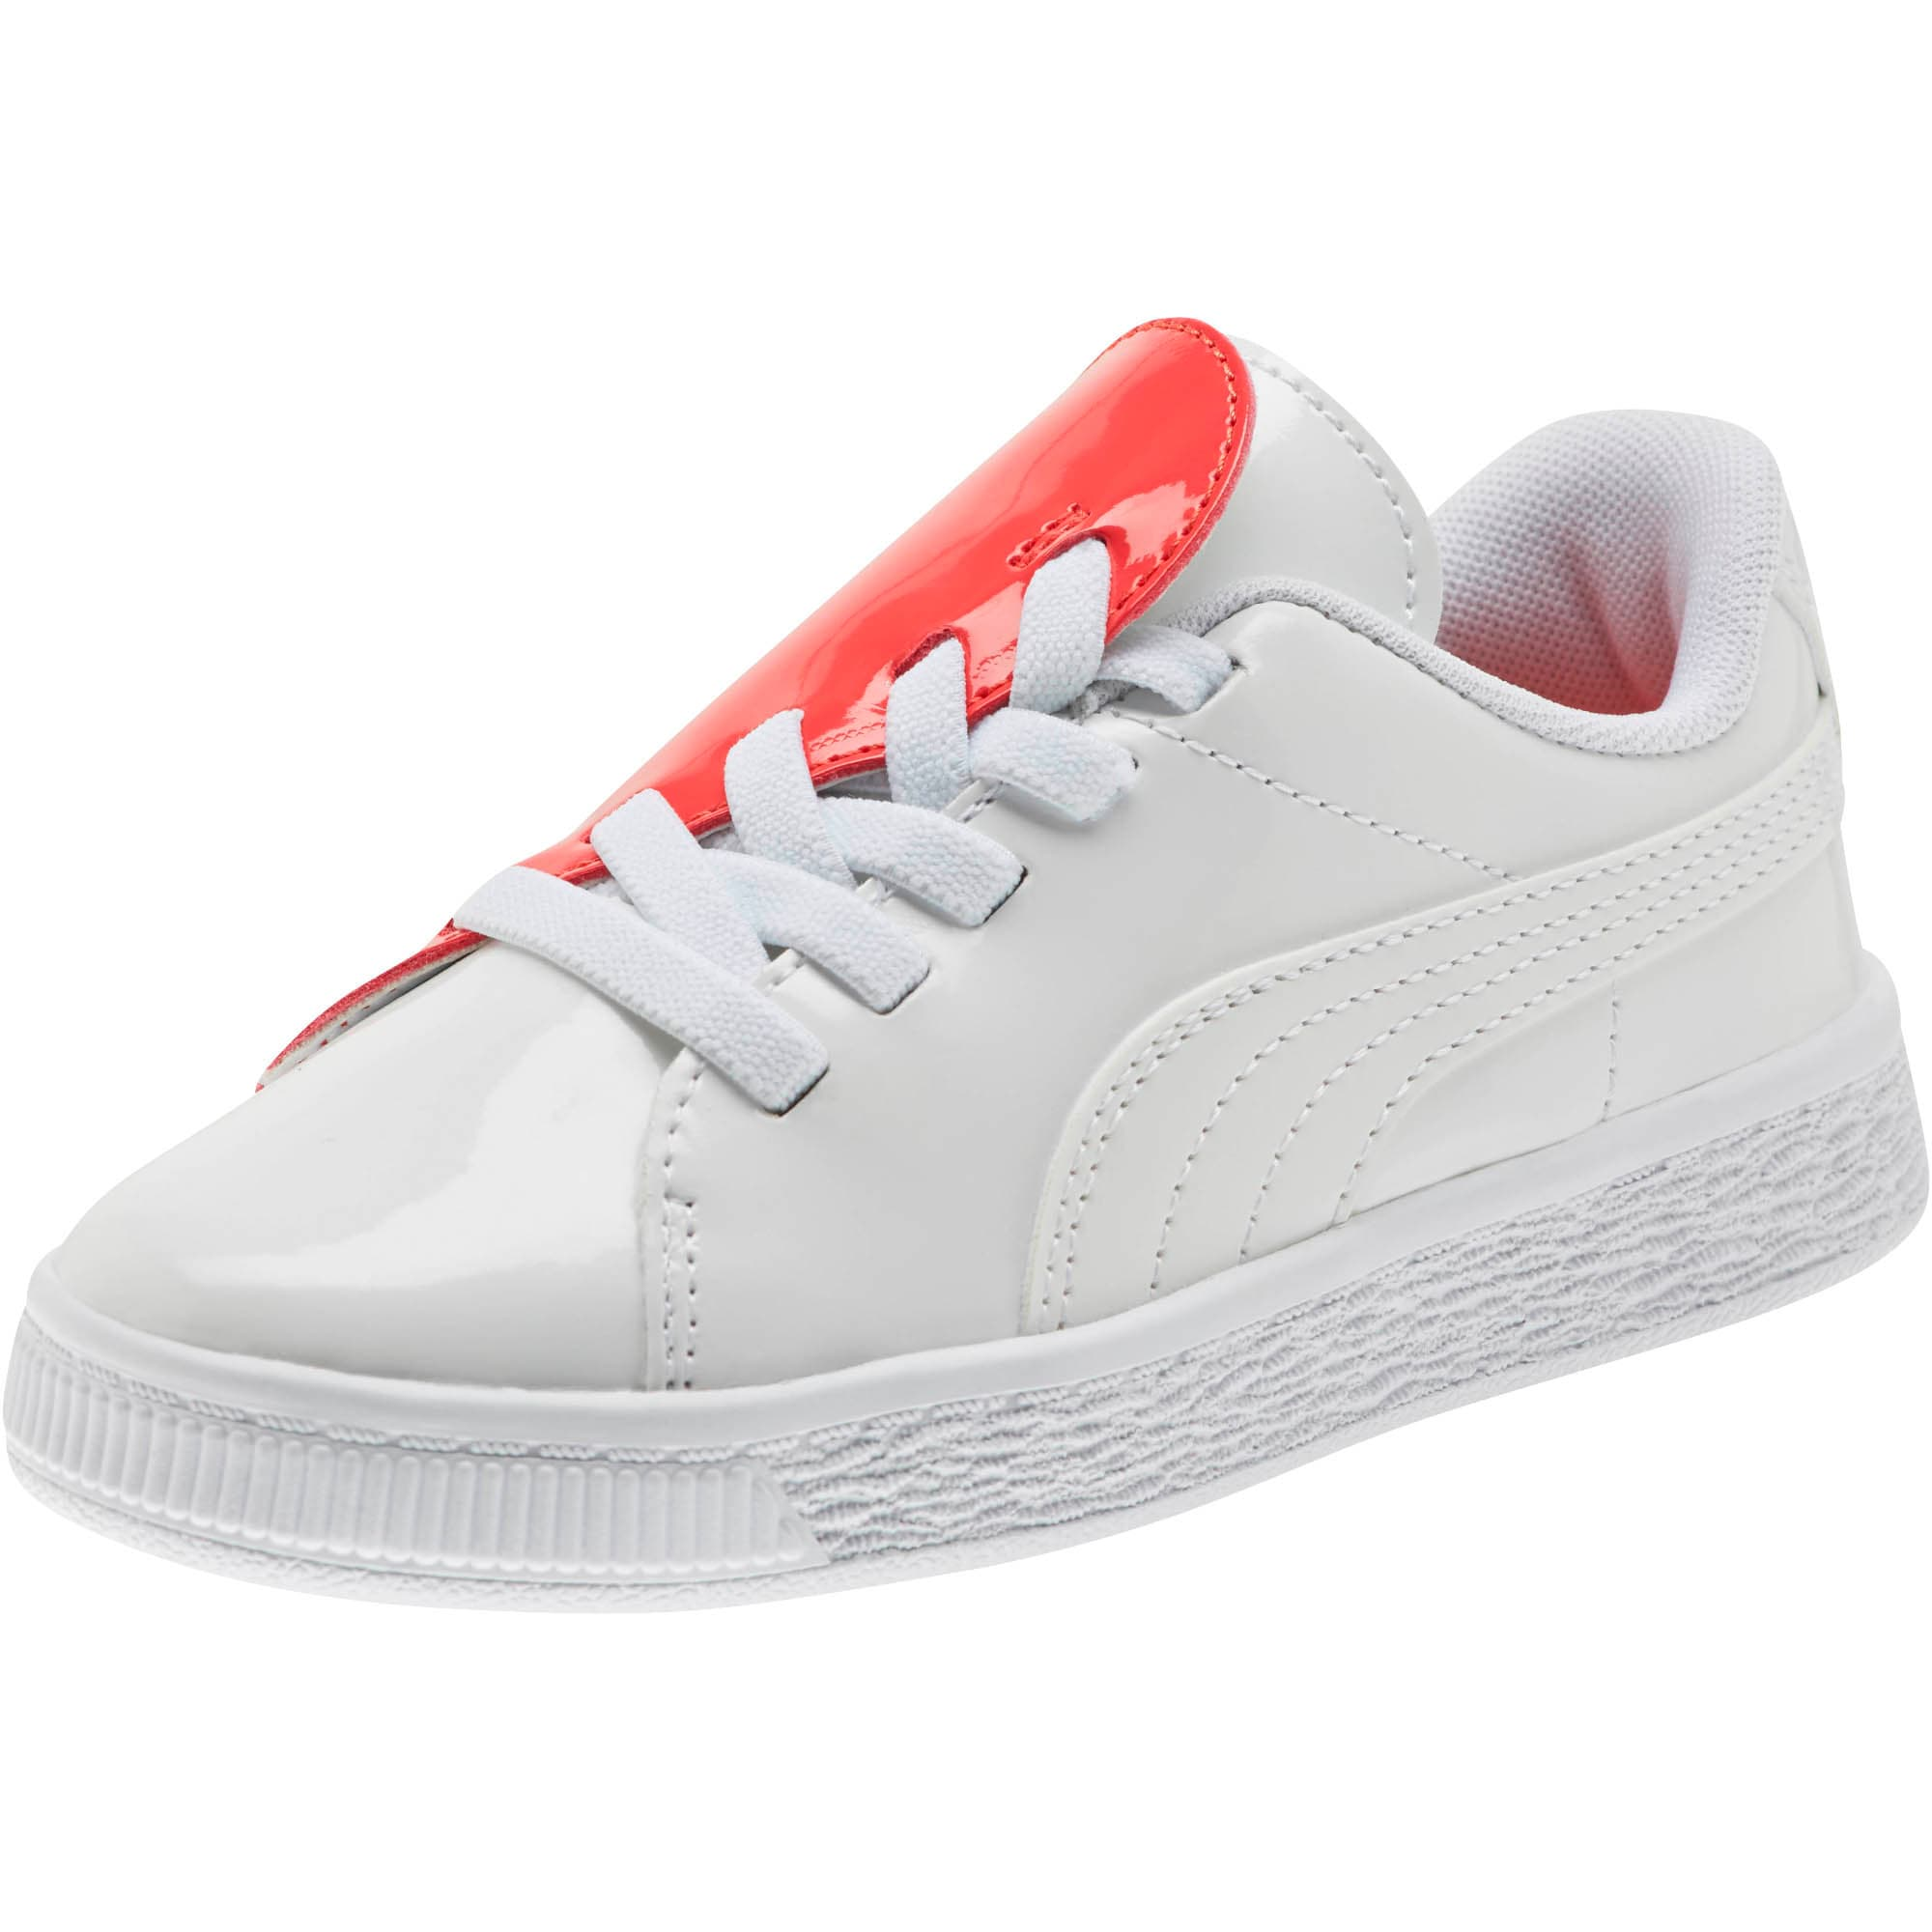 best website bcfb1 402ba Basket Crush Patent AC Little Kids' Shoes